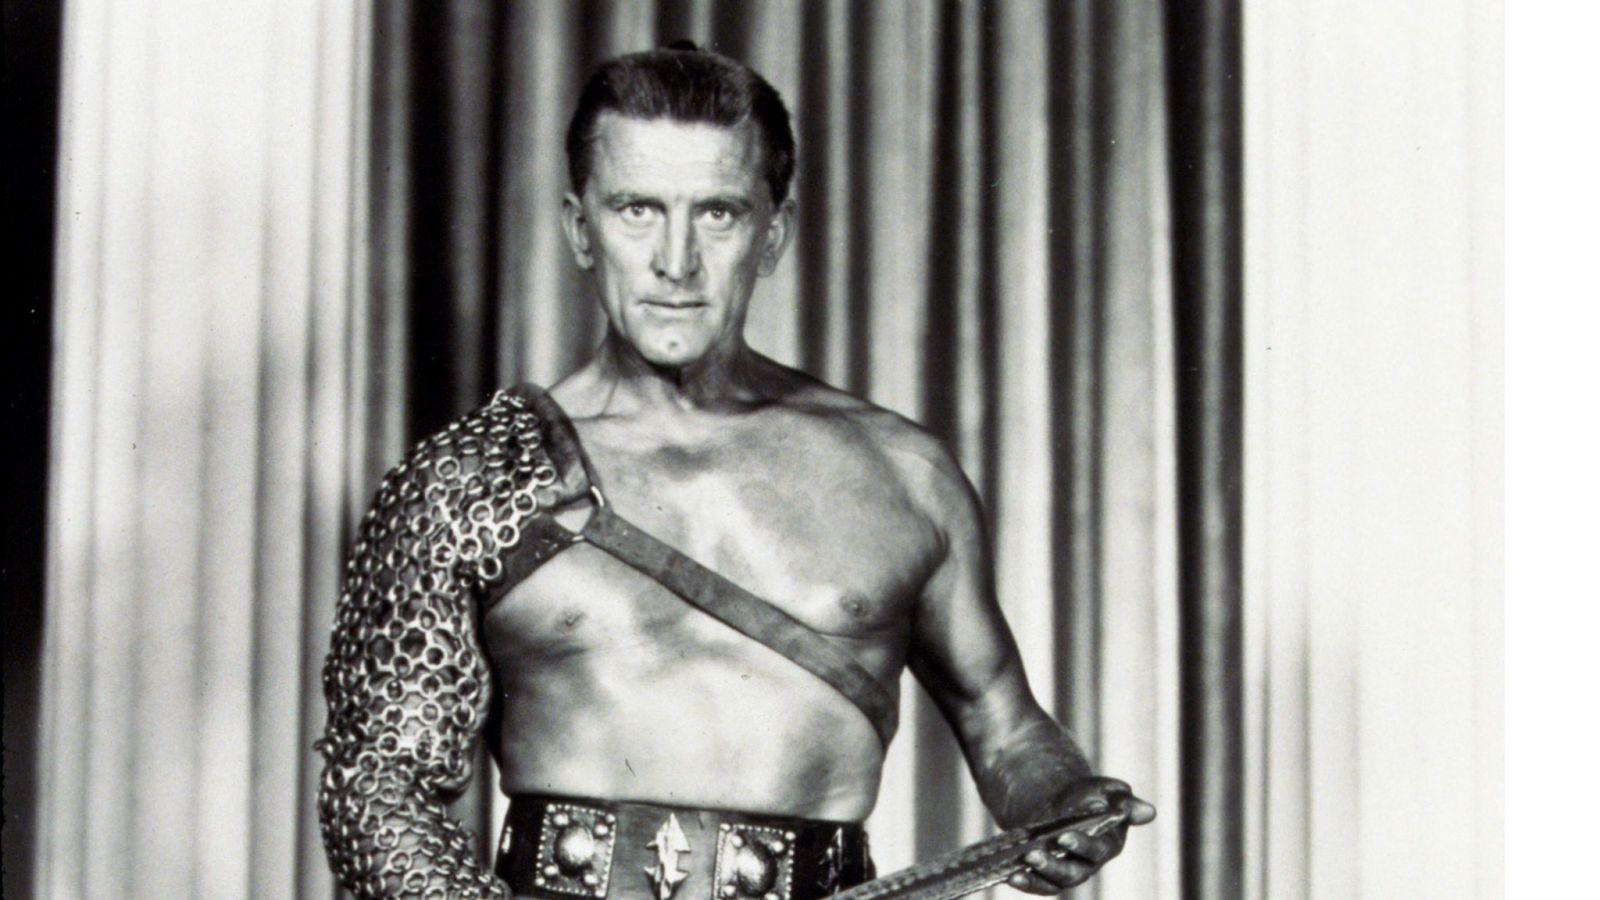 "Легенда ""Золотого века Голливуда"": в 103 года умер актер Кирк Дуглас"